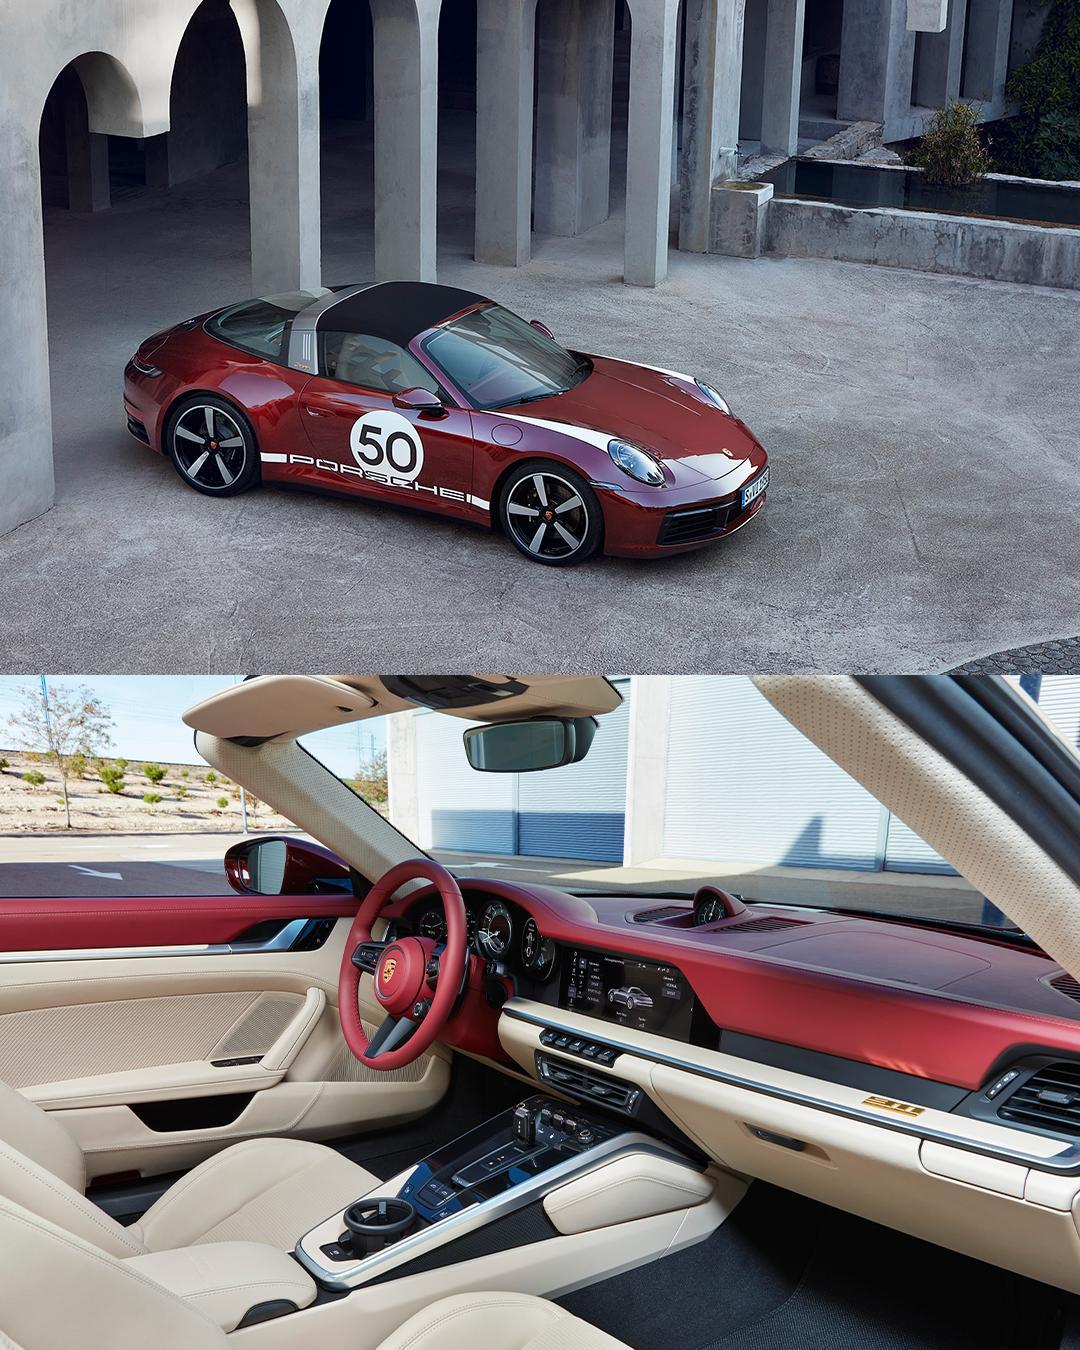 Porsche-911-Targa-4S-Heritage-Design-Edition-40-5